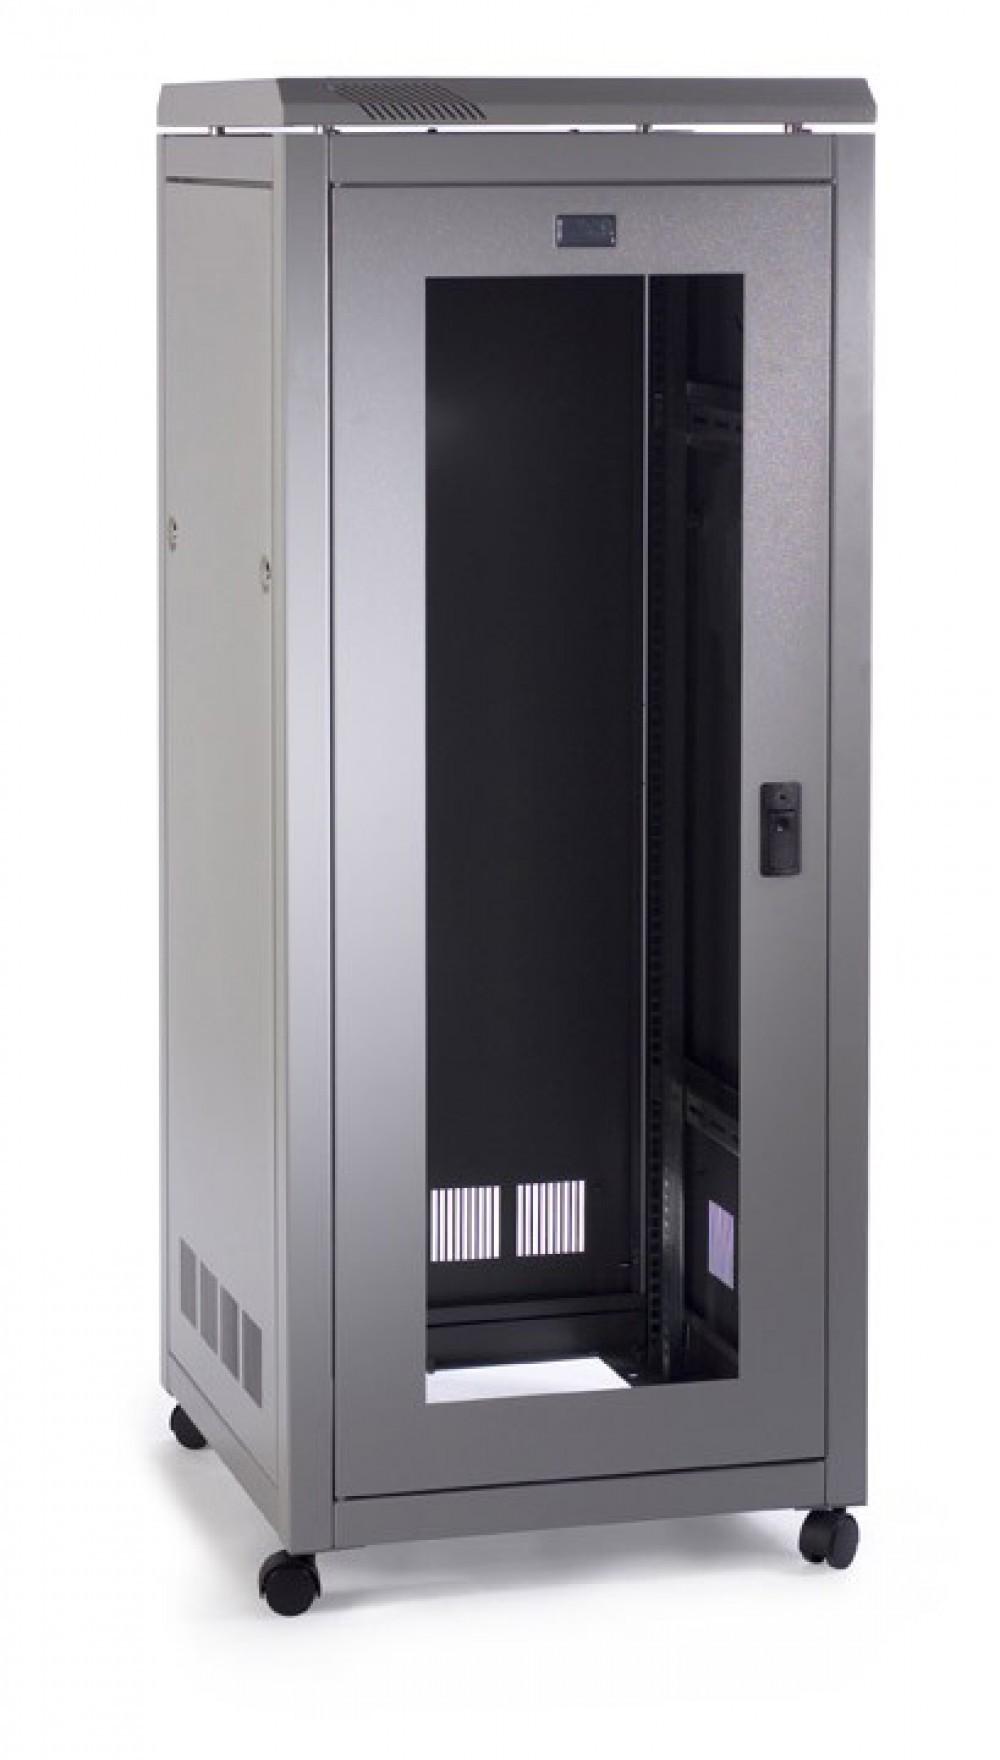 Prism Free Standing Cabinet 27U (1360x600x600)